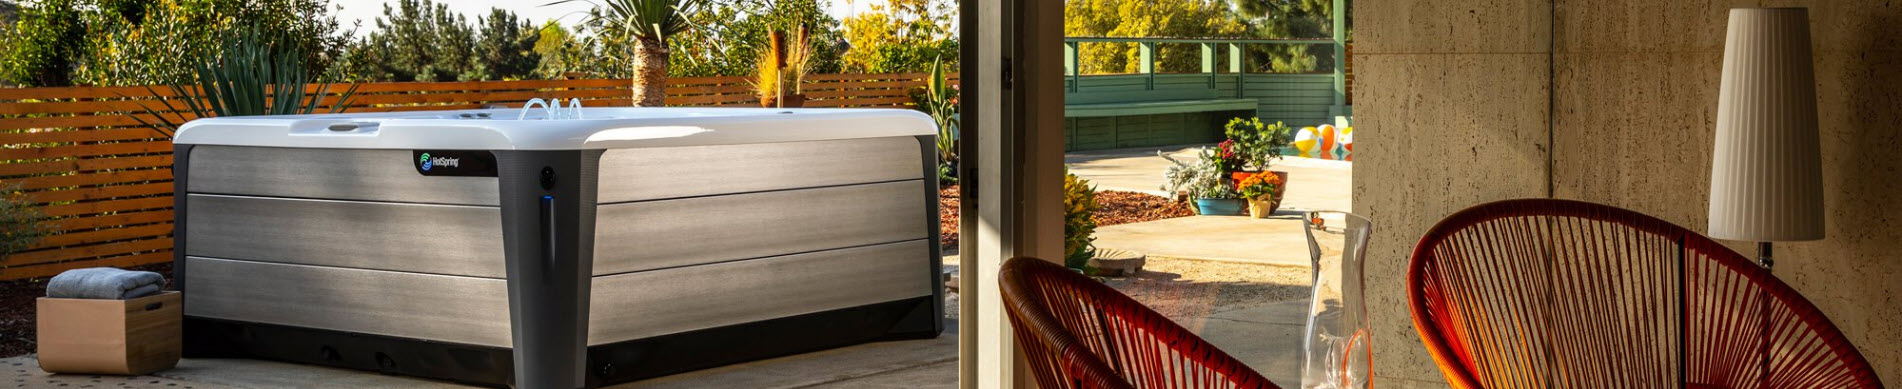 3 Ways to Build a Home Retreat with a Luxurious Hot Tub, Hot Tubs Eureka, University City MO